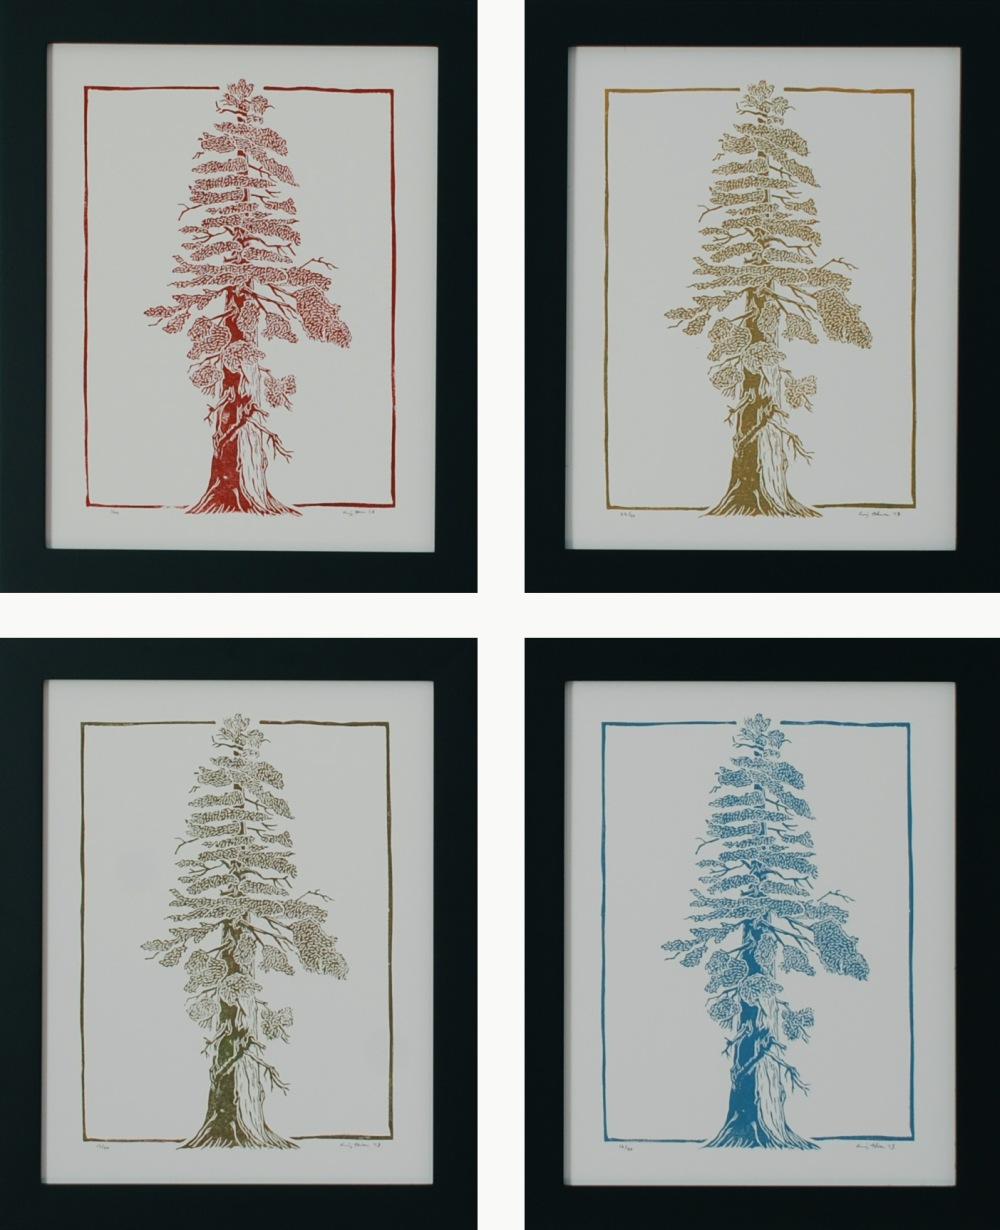 Four Color Redwoods